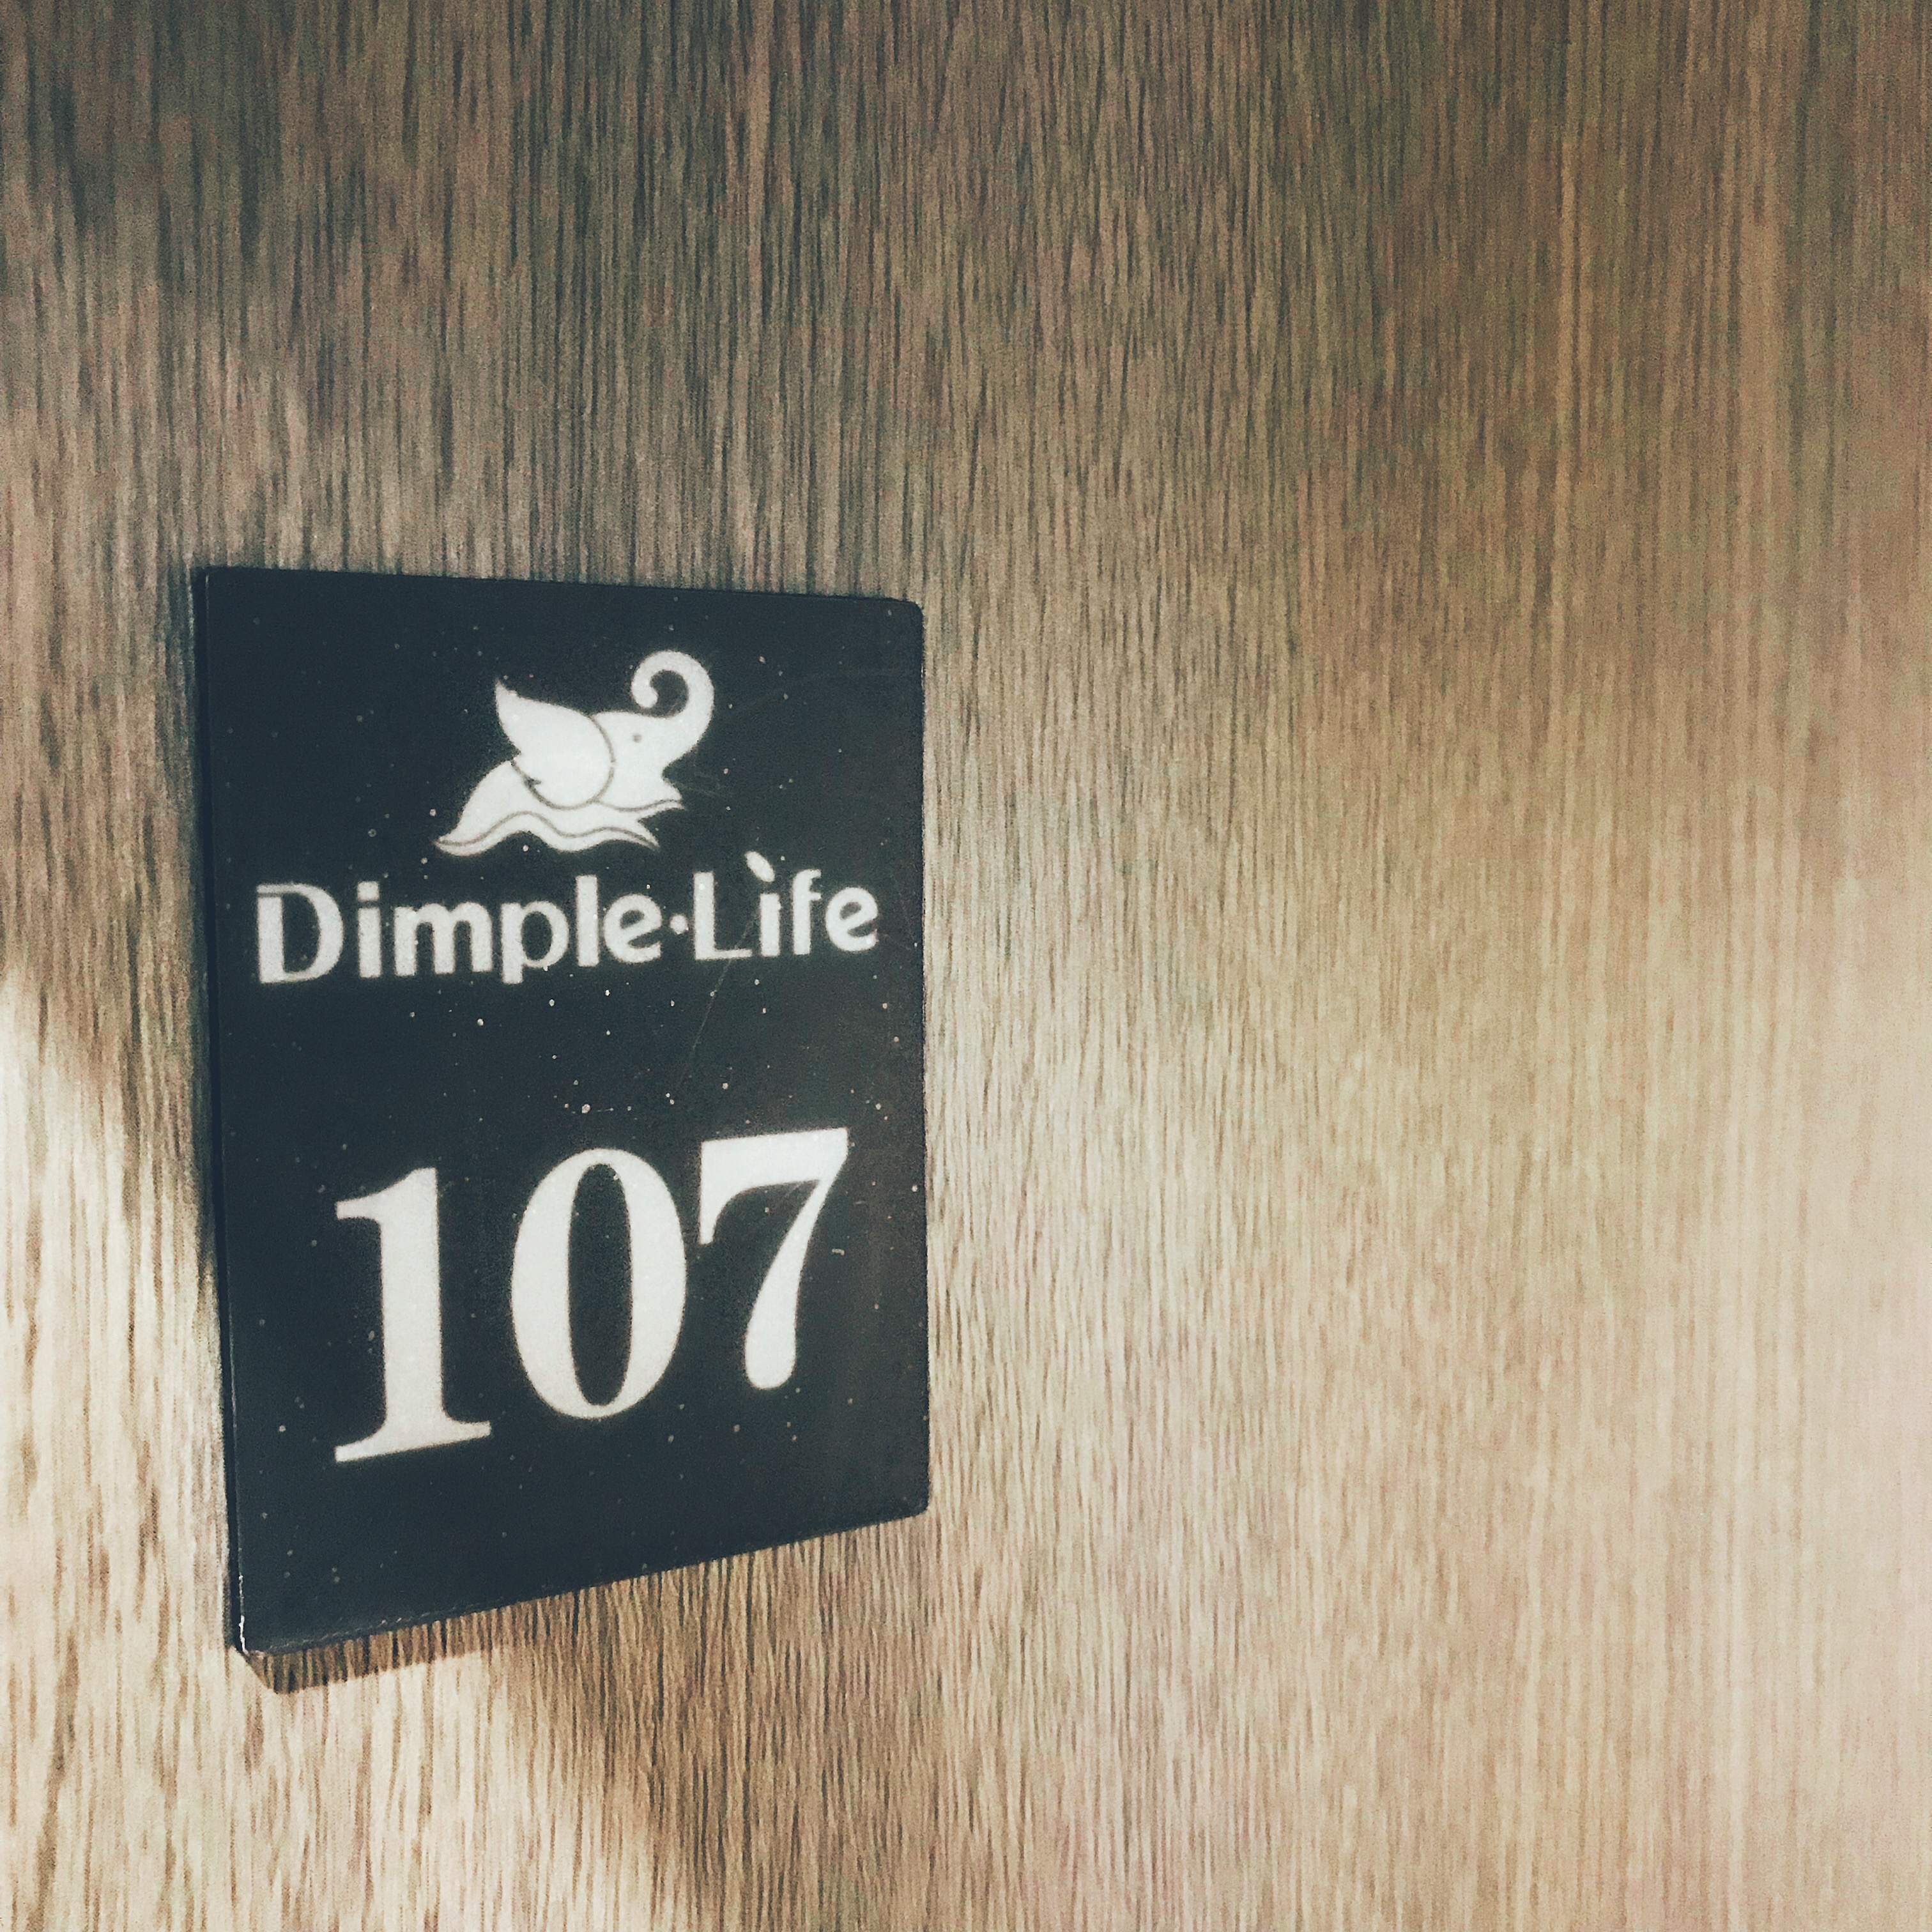 Dimple Life Hostel